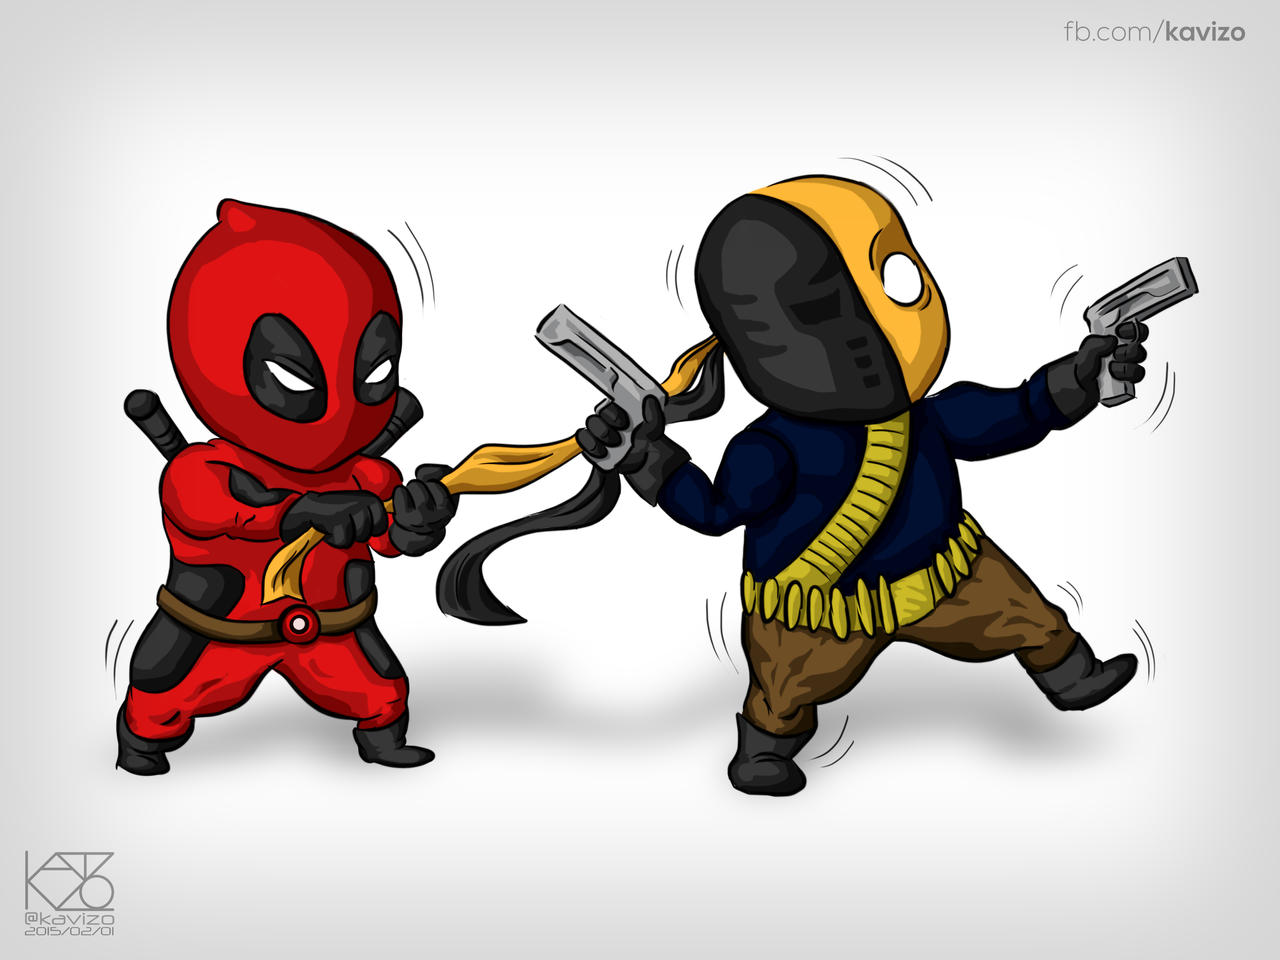 Chibi Deadpool And Deathstroke By Kavizo KAVIZO